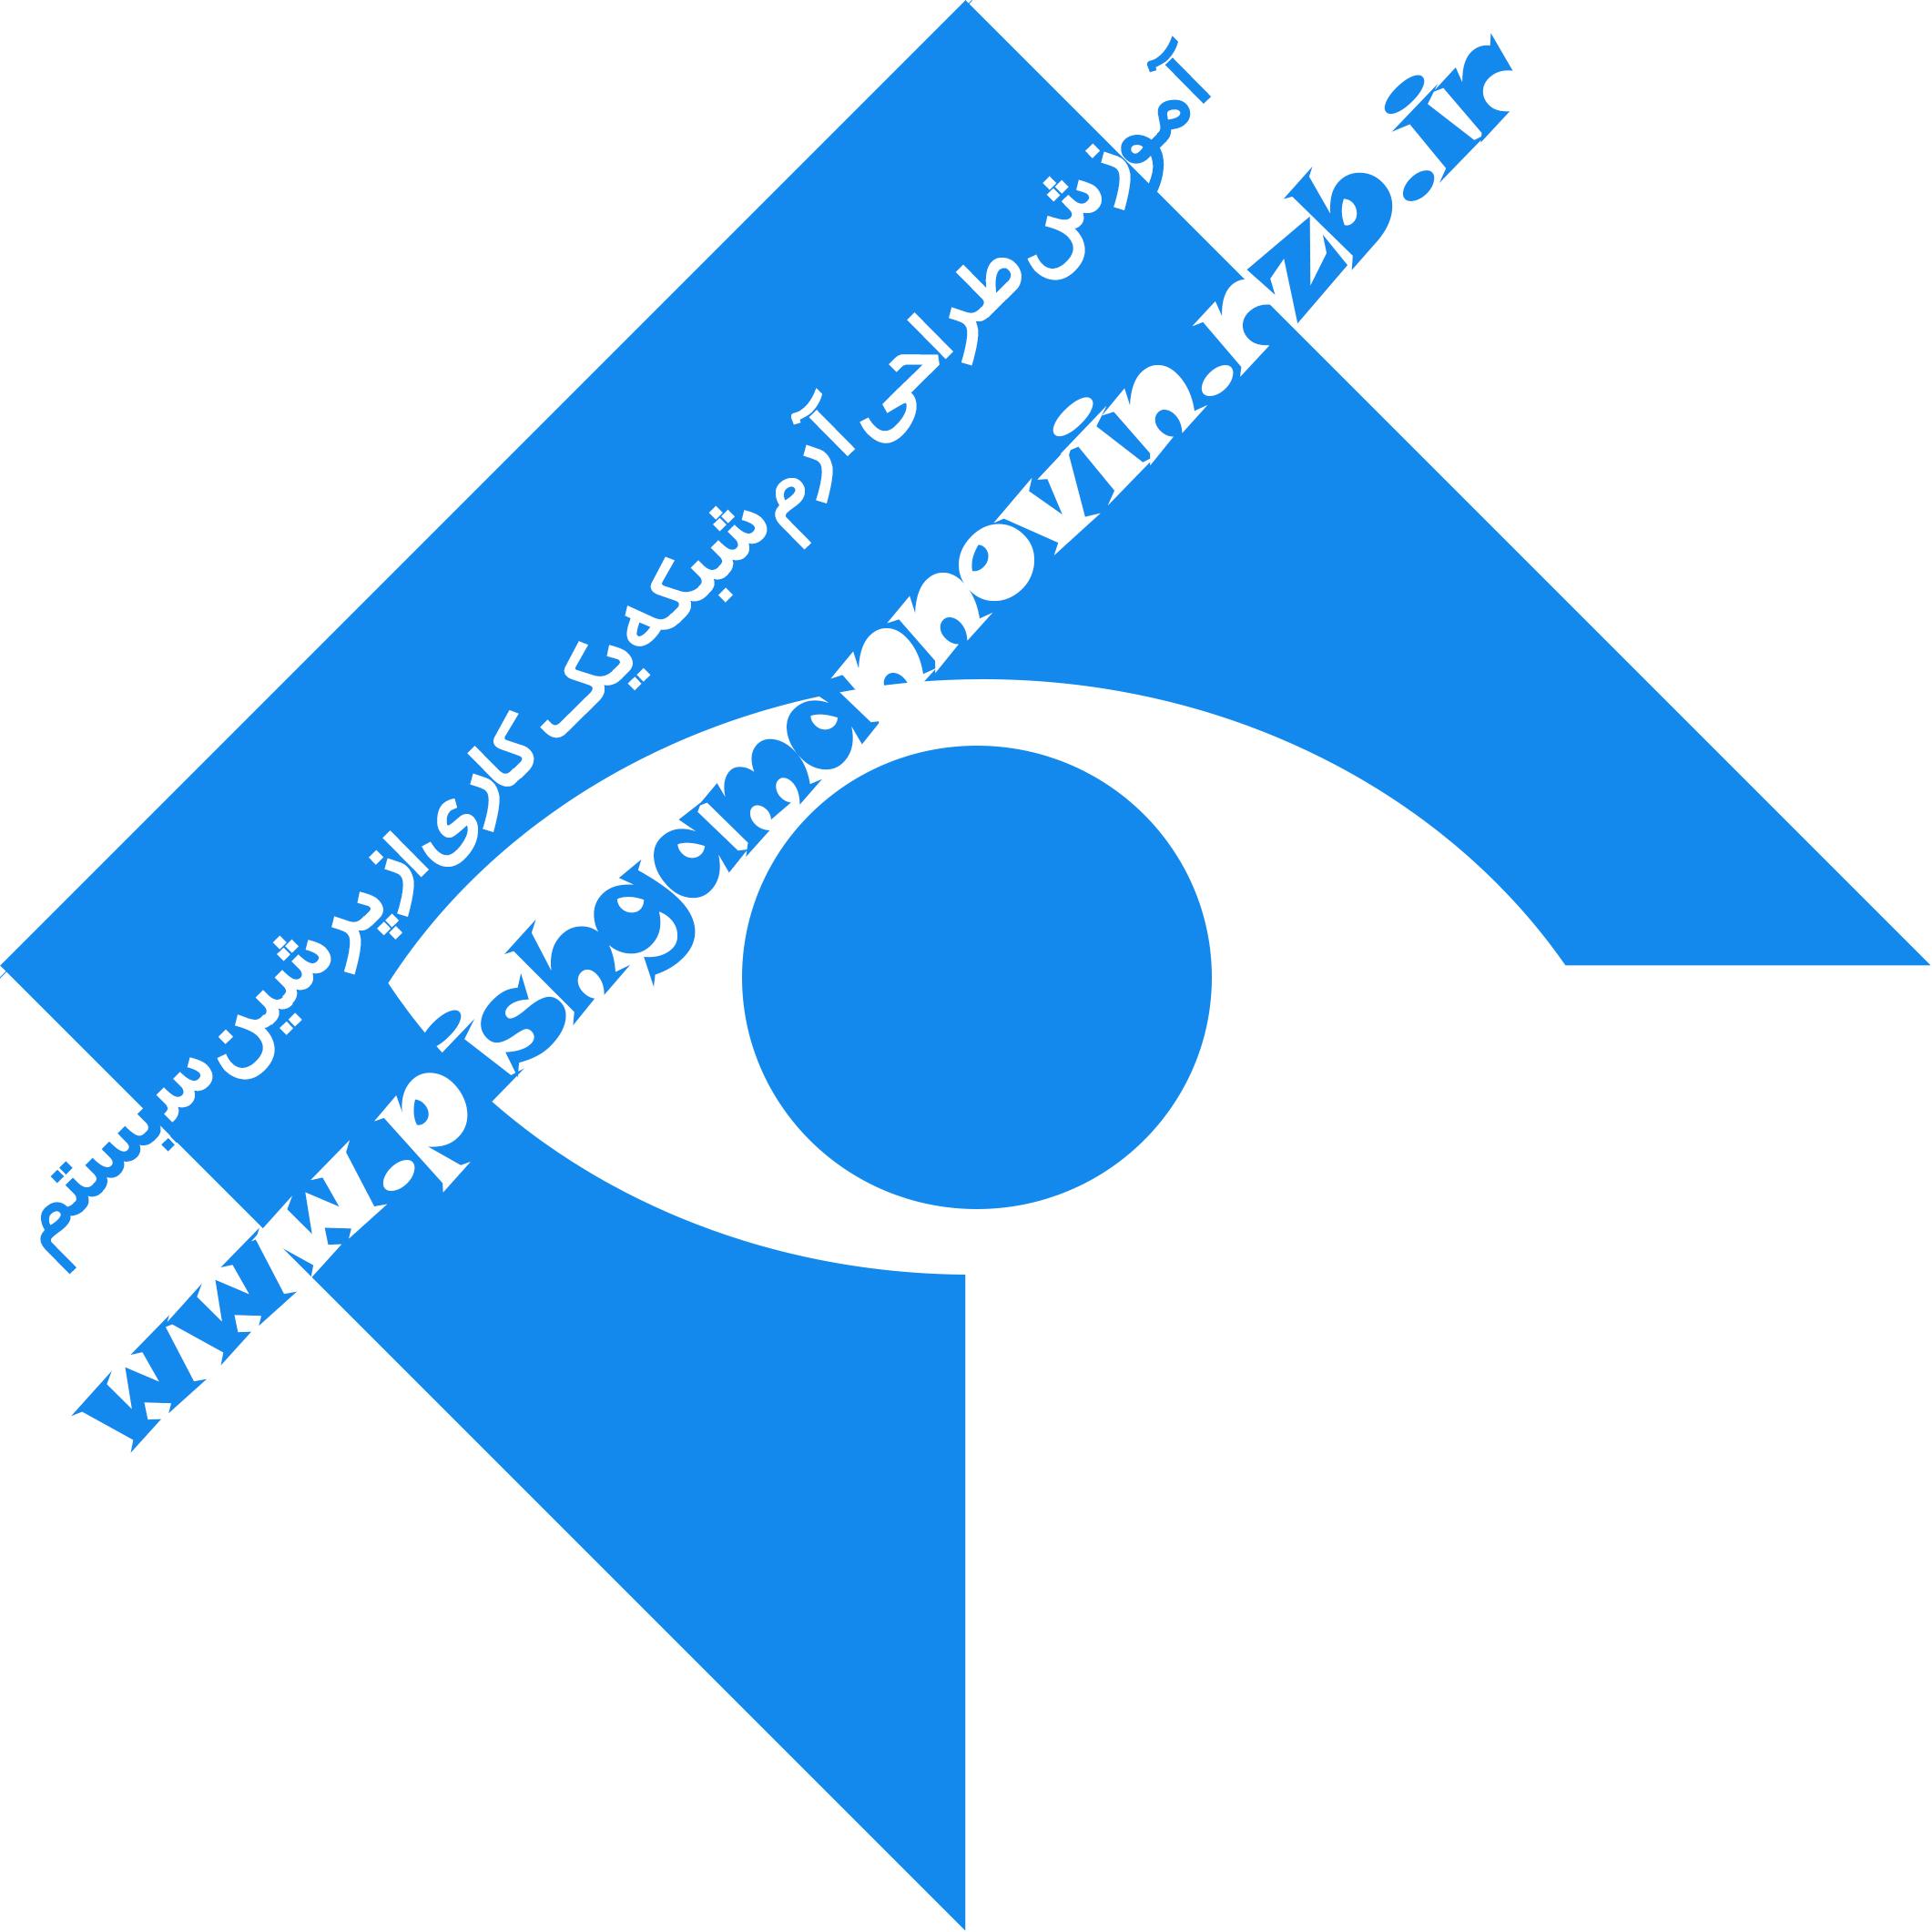 http://s5.picofile.com/file/8156282618/%D8%B4%D8%A8%DA%A9%D9%871.jpg